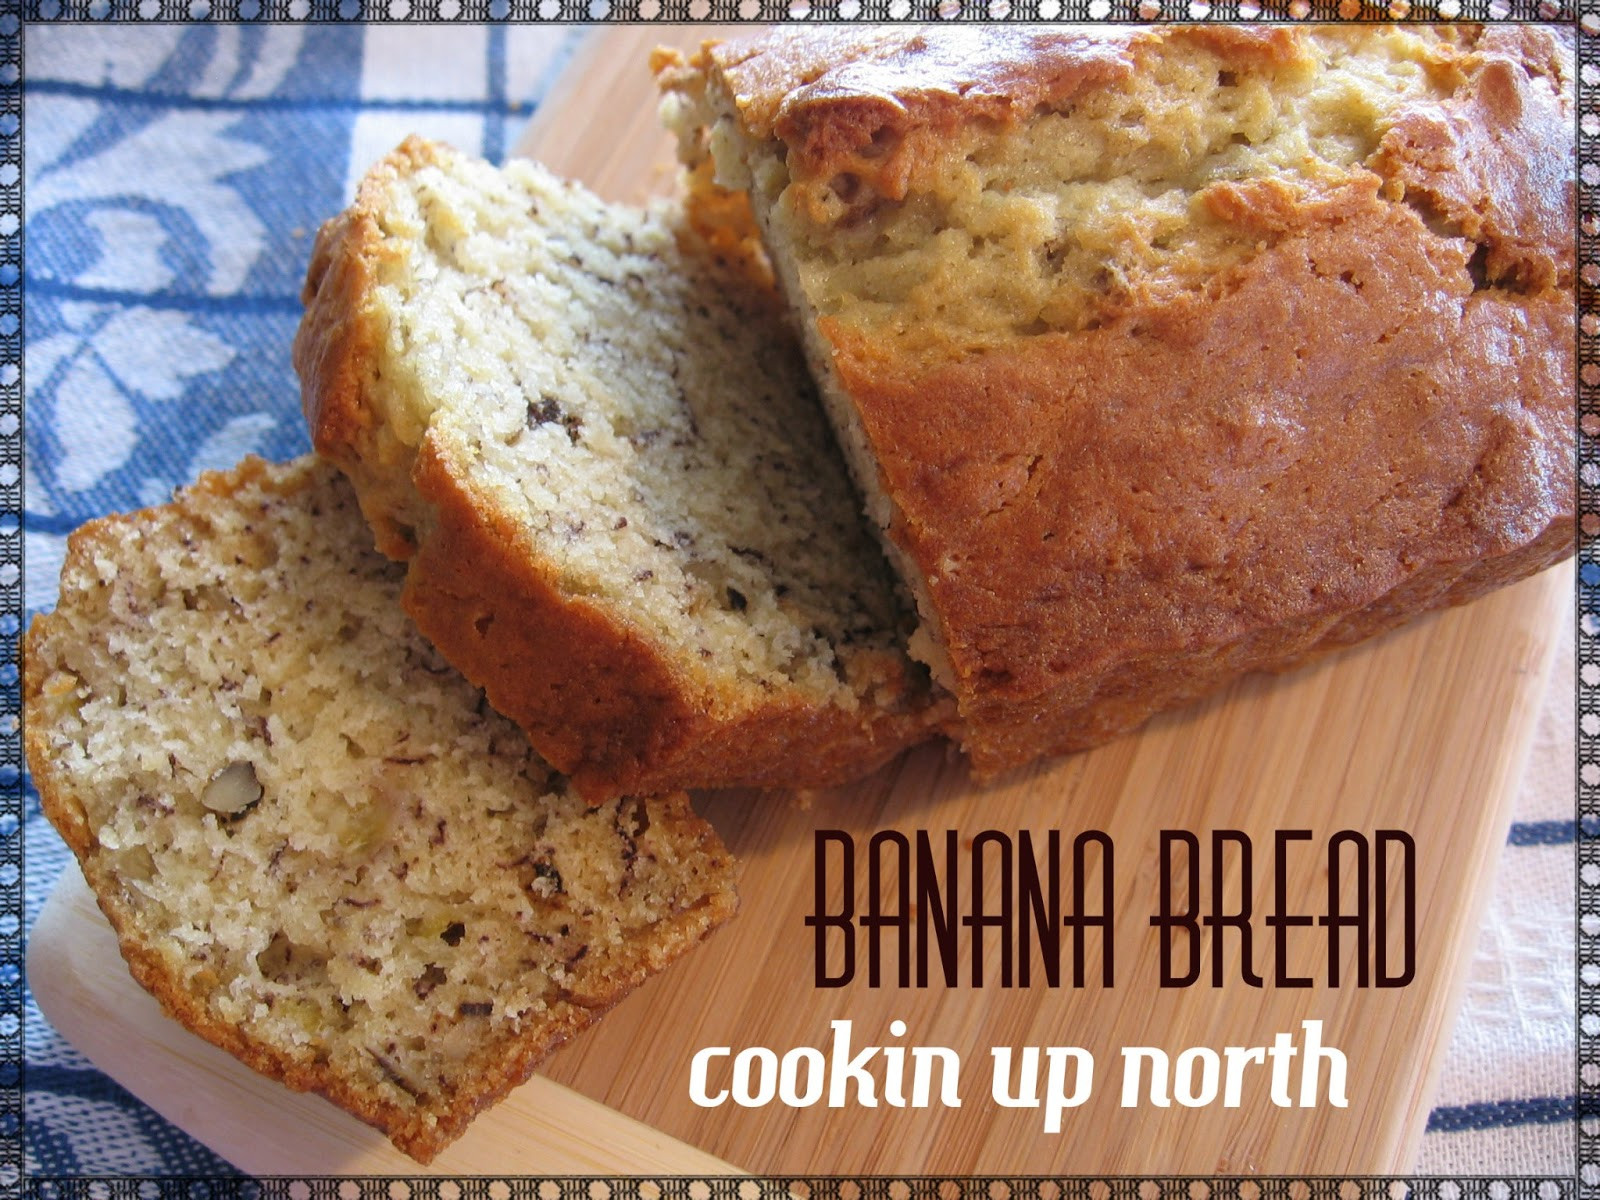 Betty Crocker Banana Bread  cookin up north Monday s with Mom Betty Crocker